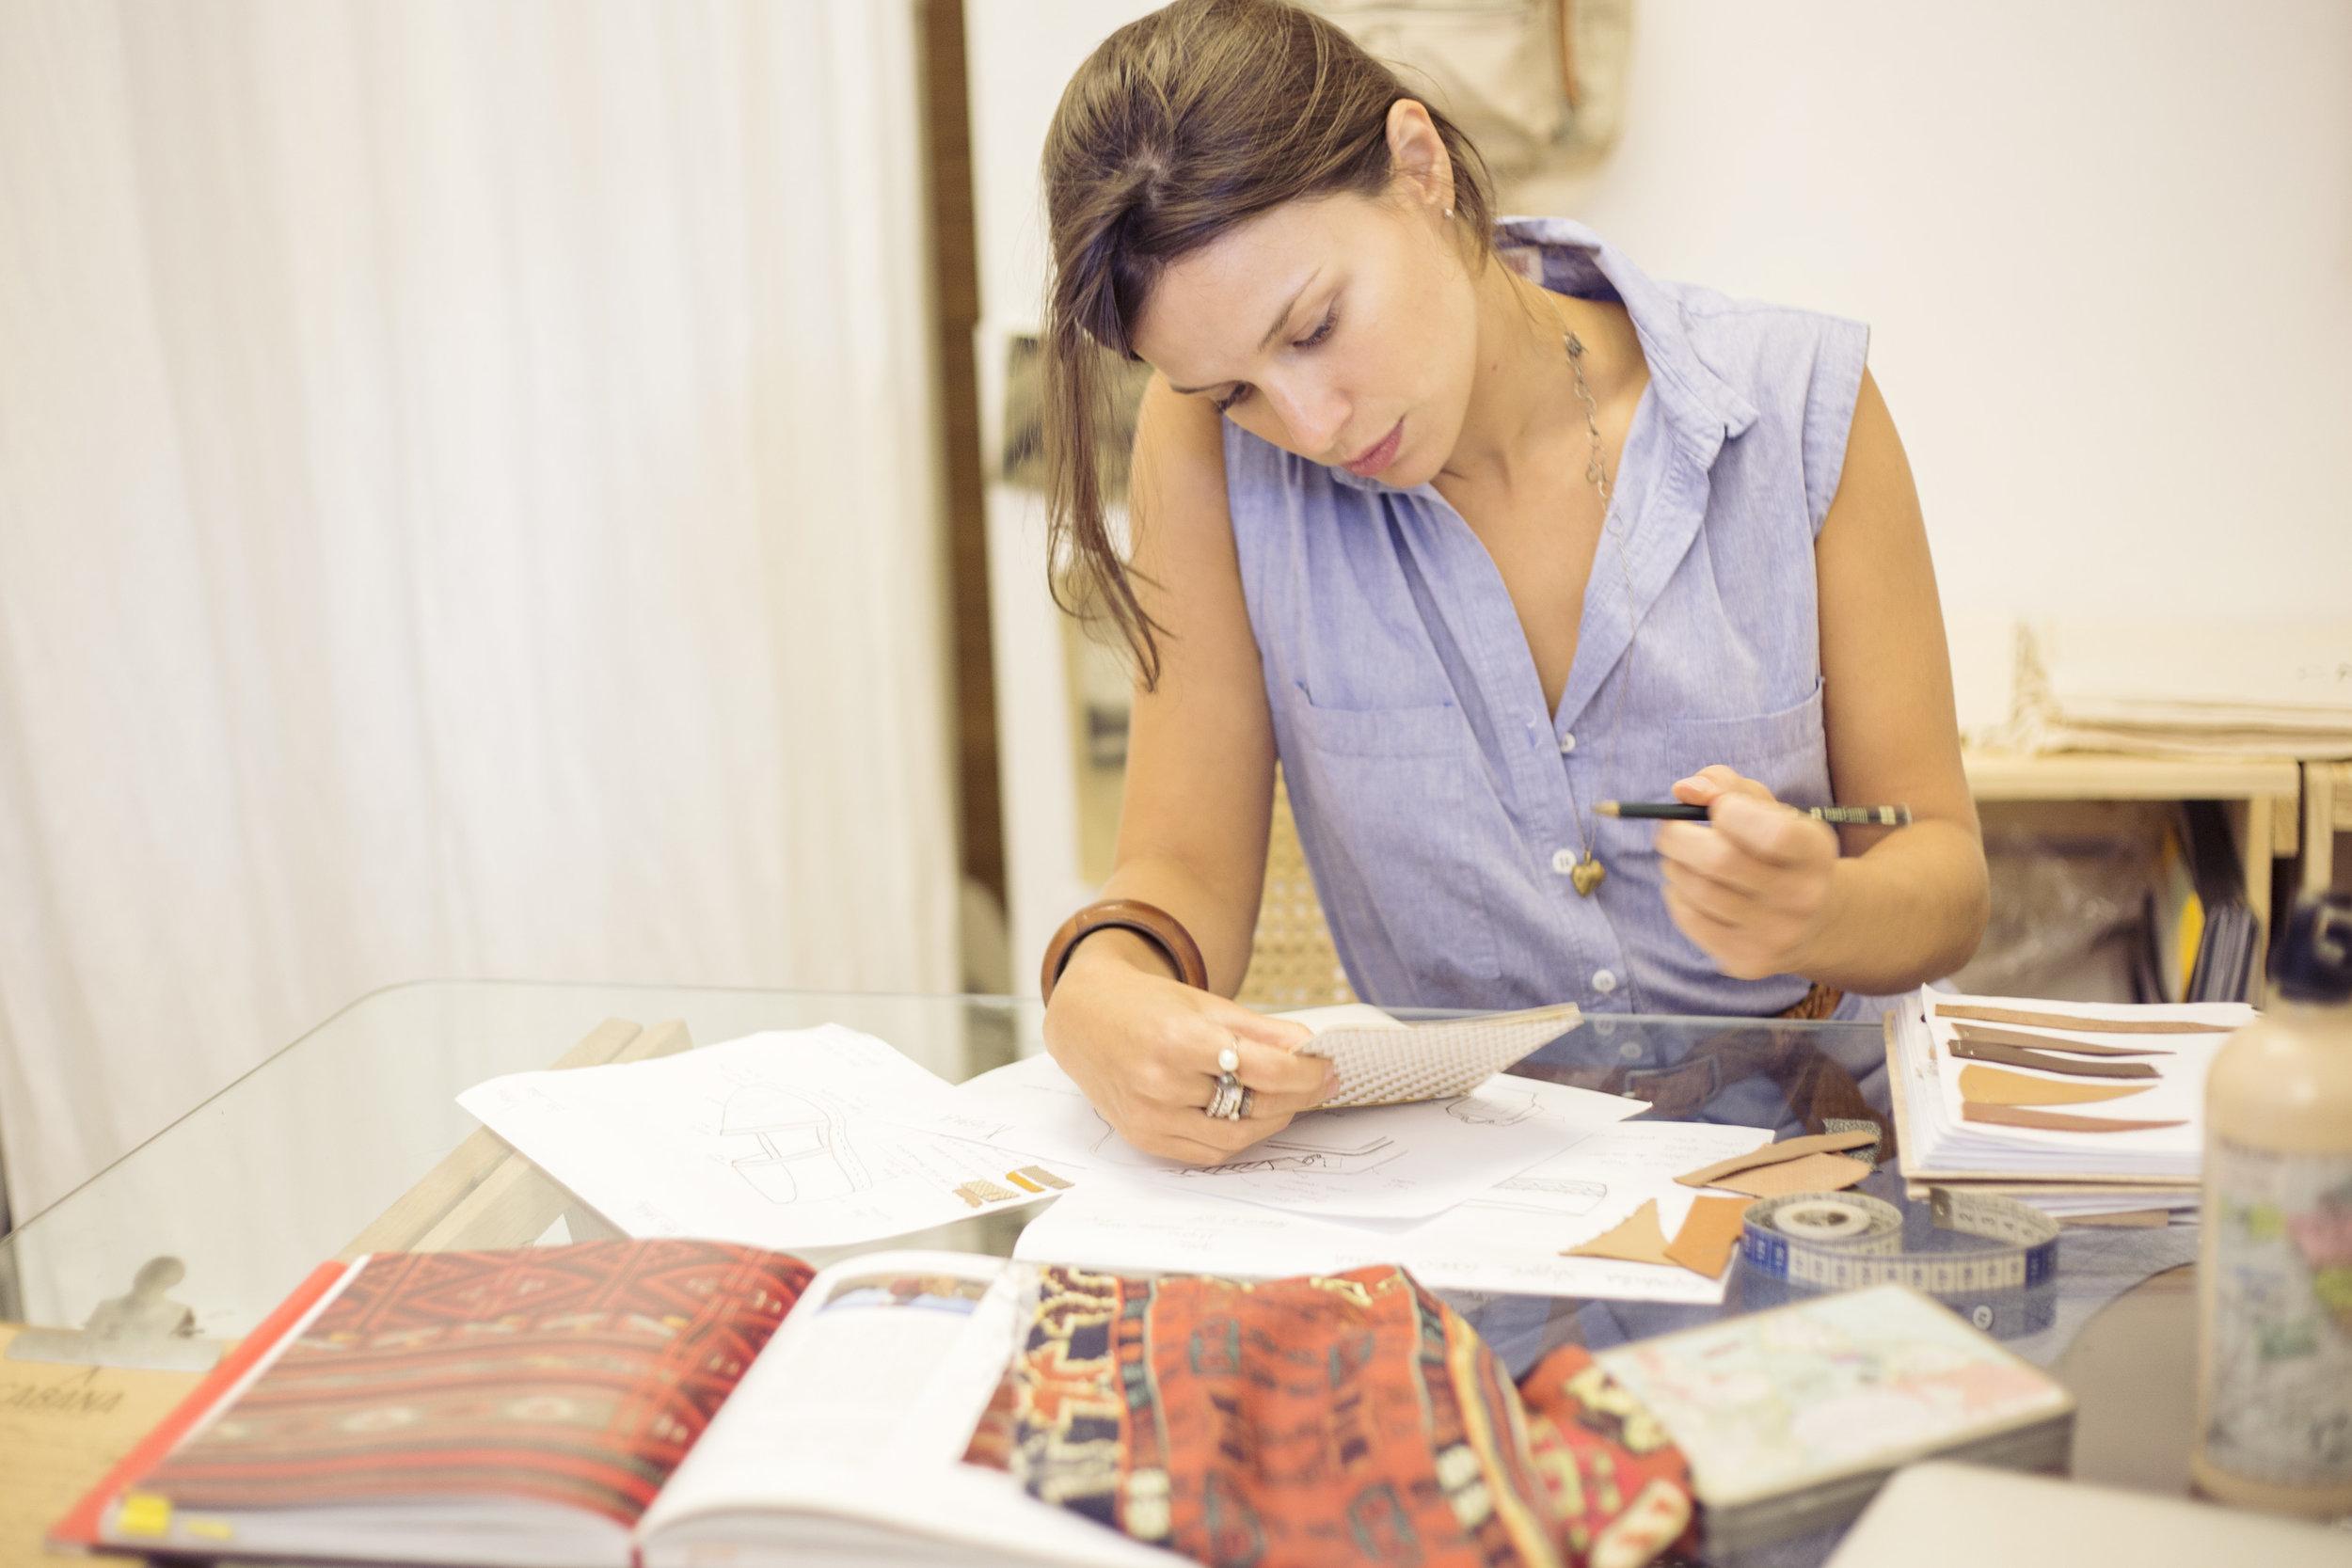 ManuRodrigues 226 - Interview: Manuela Rodrigues, founder Cabana Craft